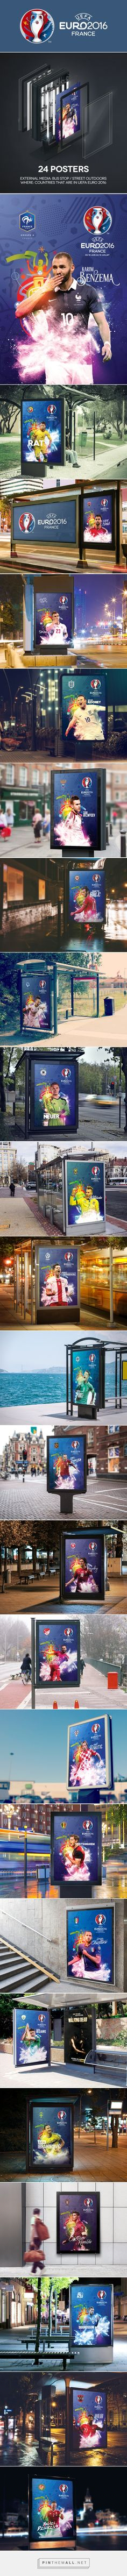 UEFA Euro 2016 Posters on Behance - created on 2016-02-07 23:08:08